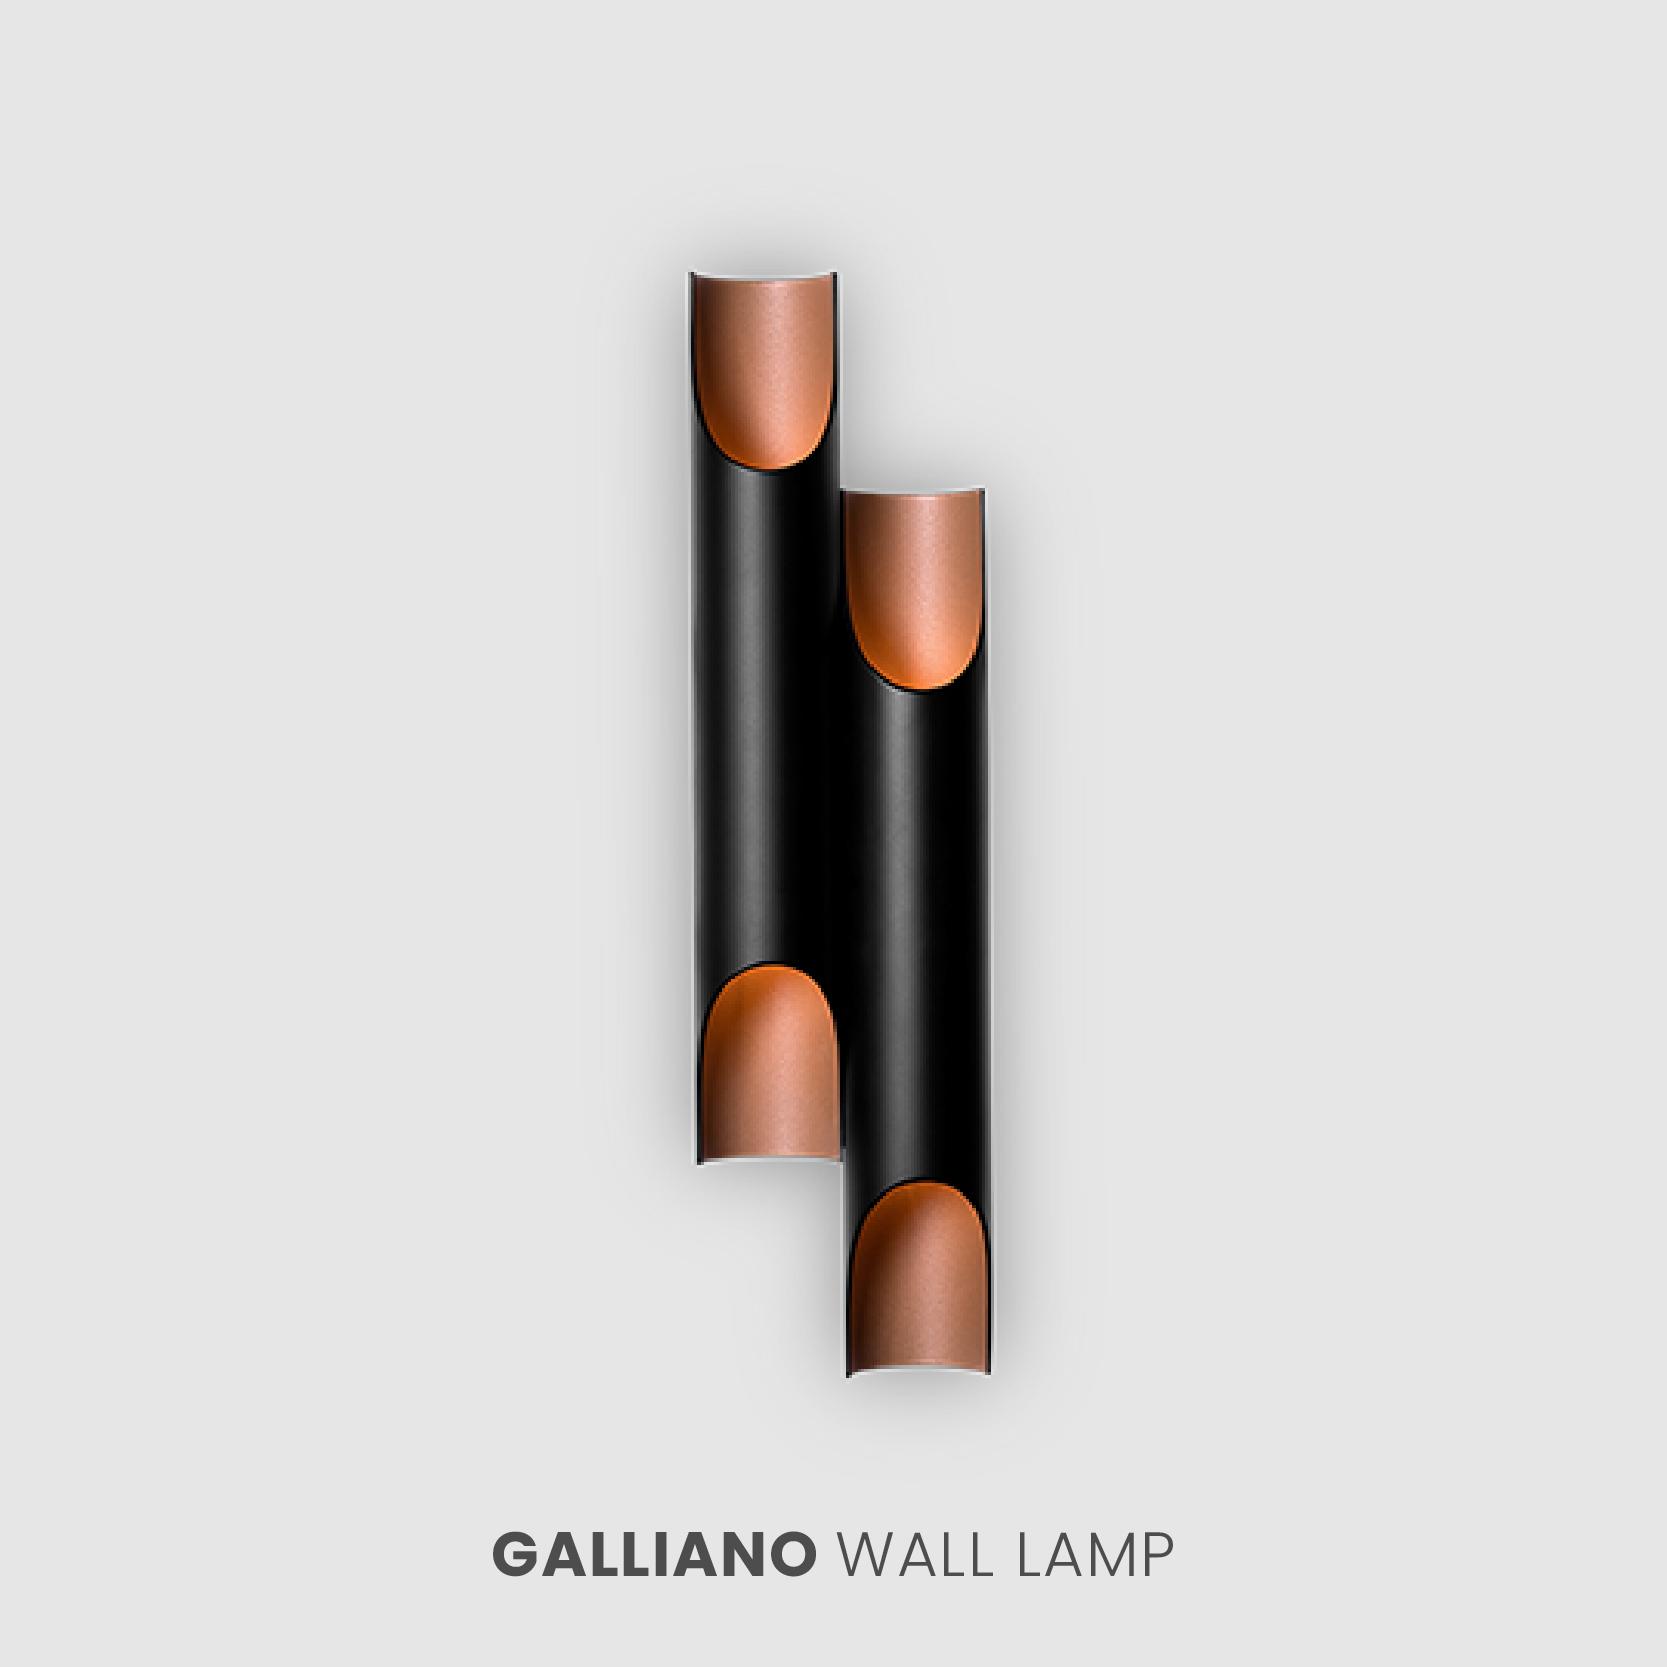 Galliano Wall